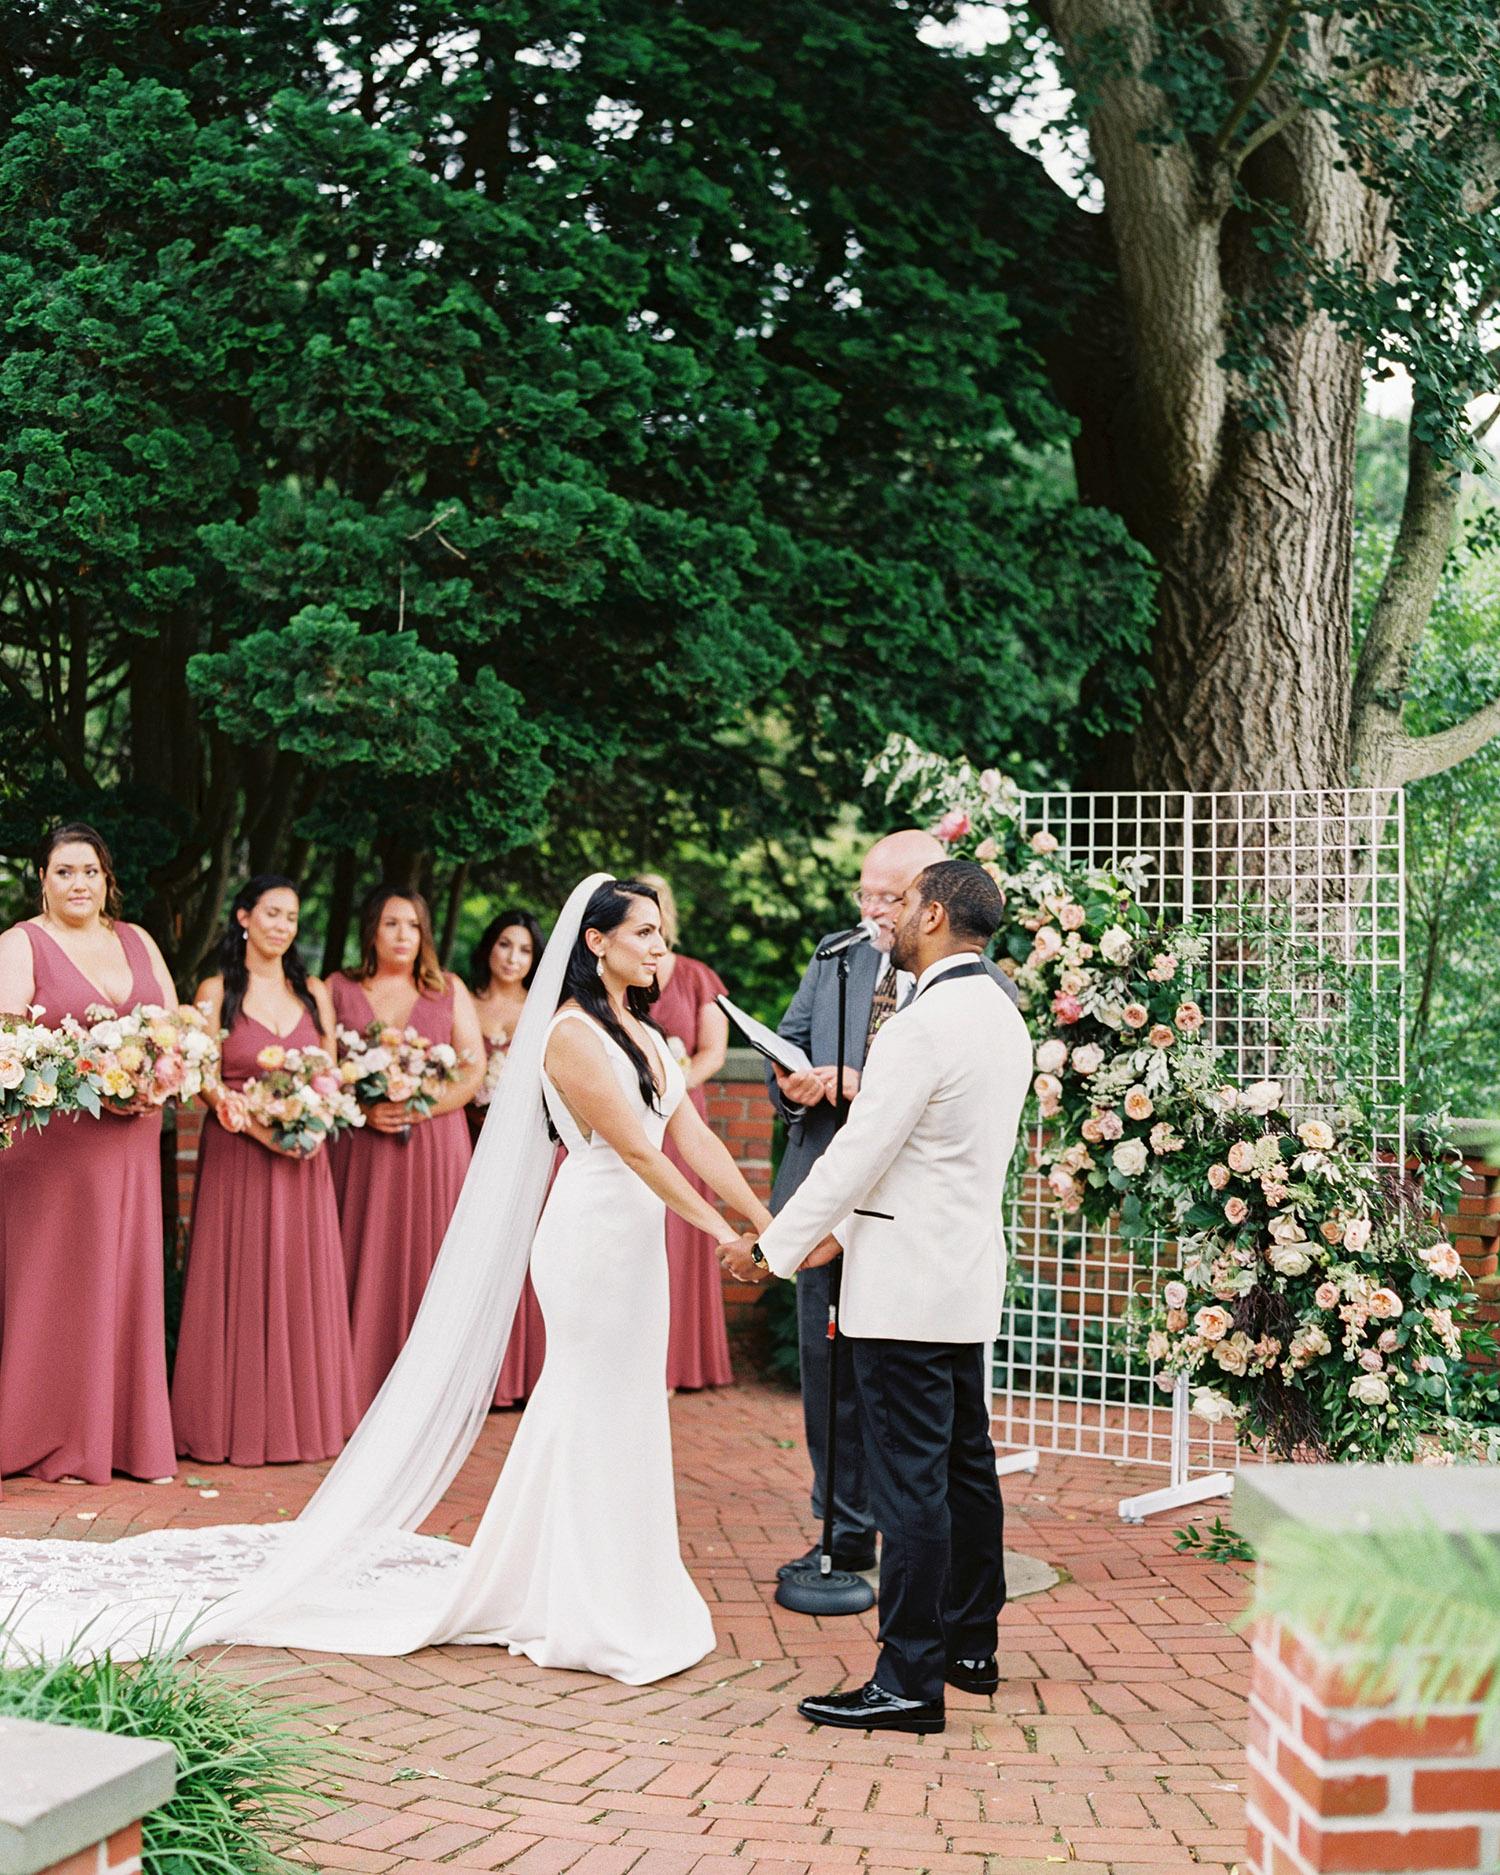 noel mike wedding ceremony couple holding hands